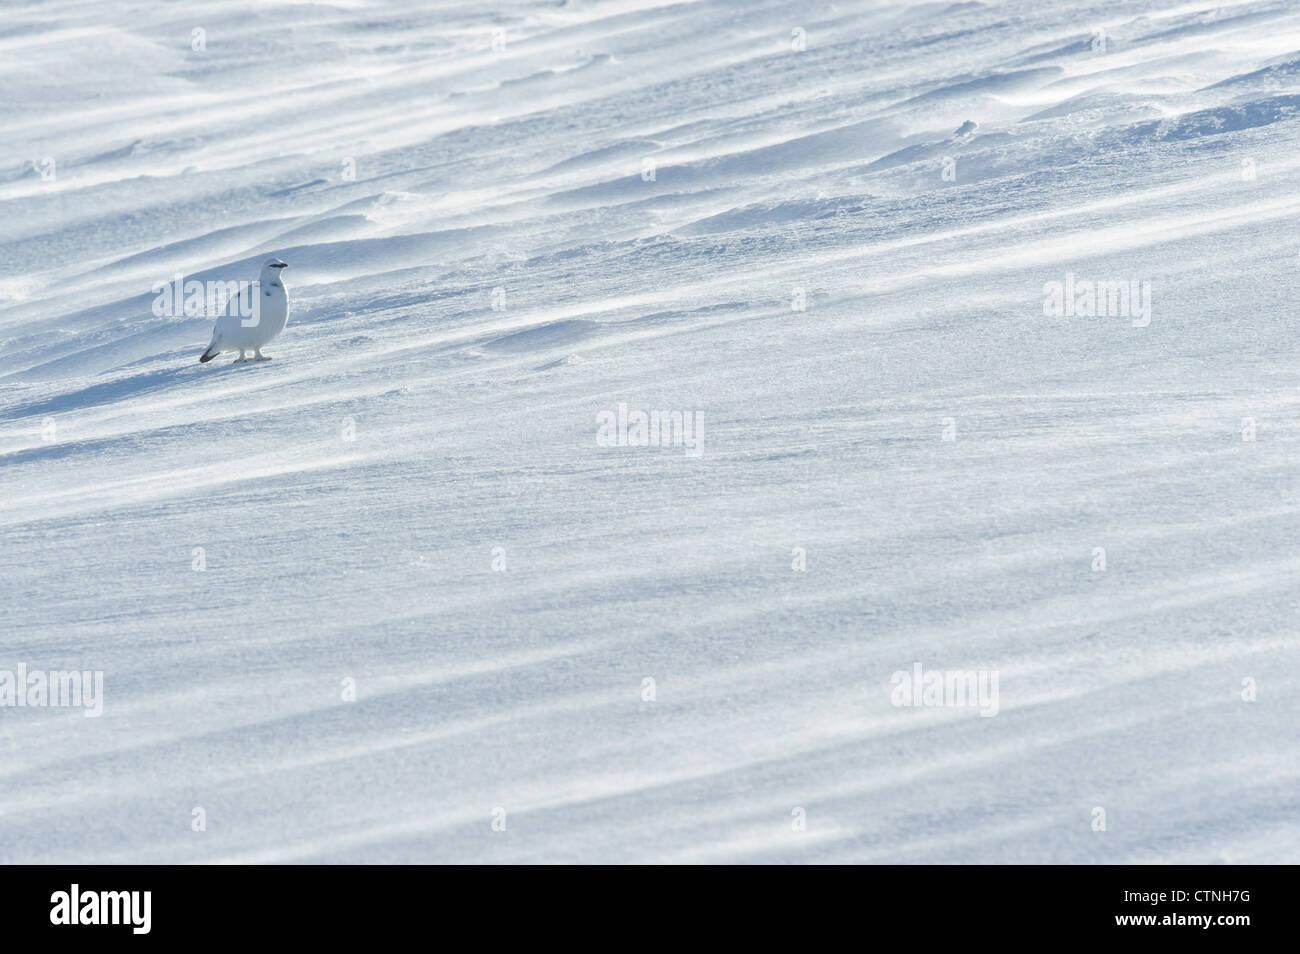 Rock ptarmigan (Lagopus mutus) in winter plumage. Cairngorms National Park, Scotland. February. - Stock Image